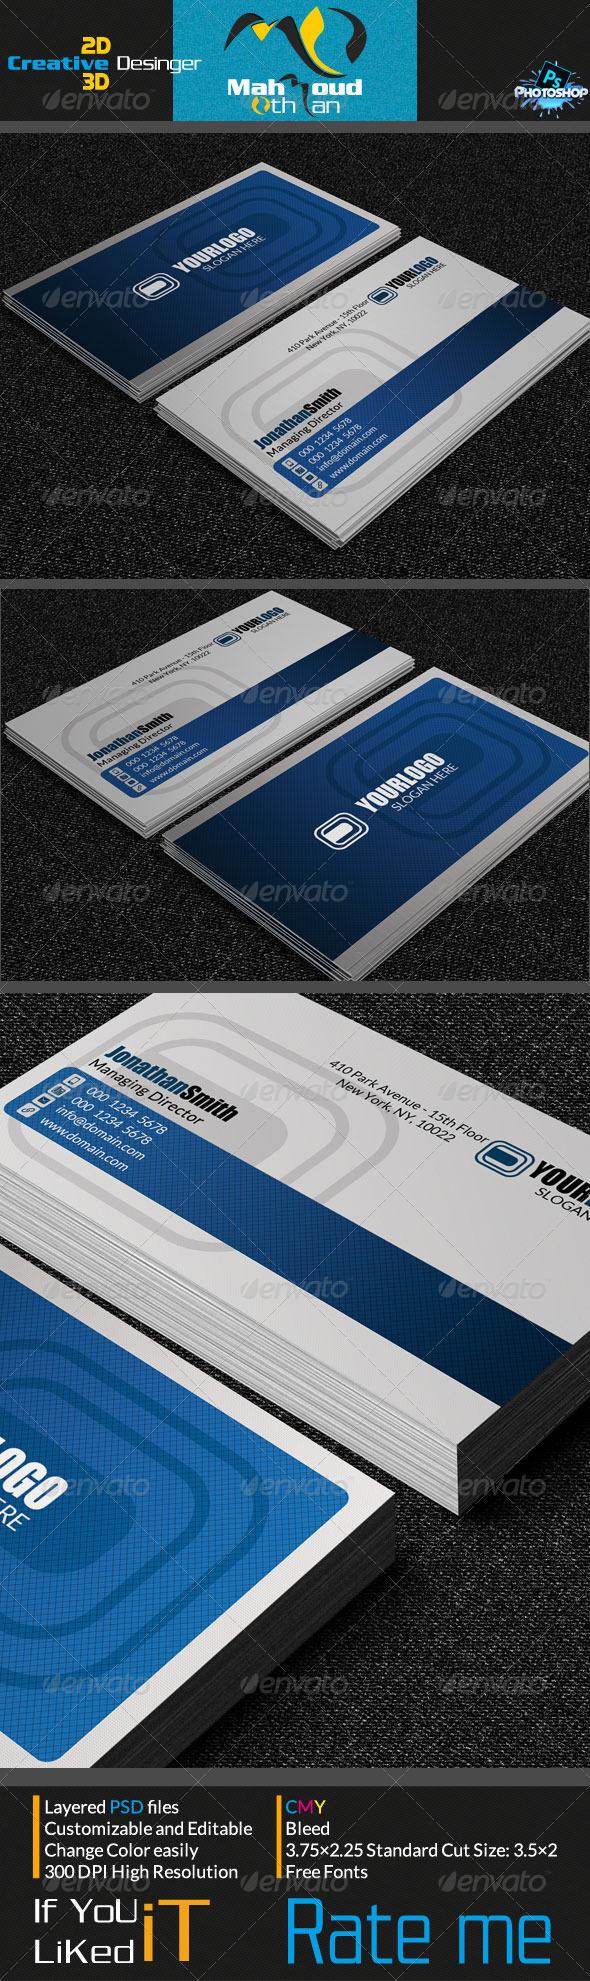 Creative Business Card V04 - Creative Business Cards